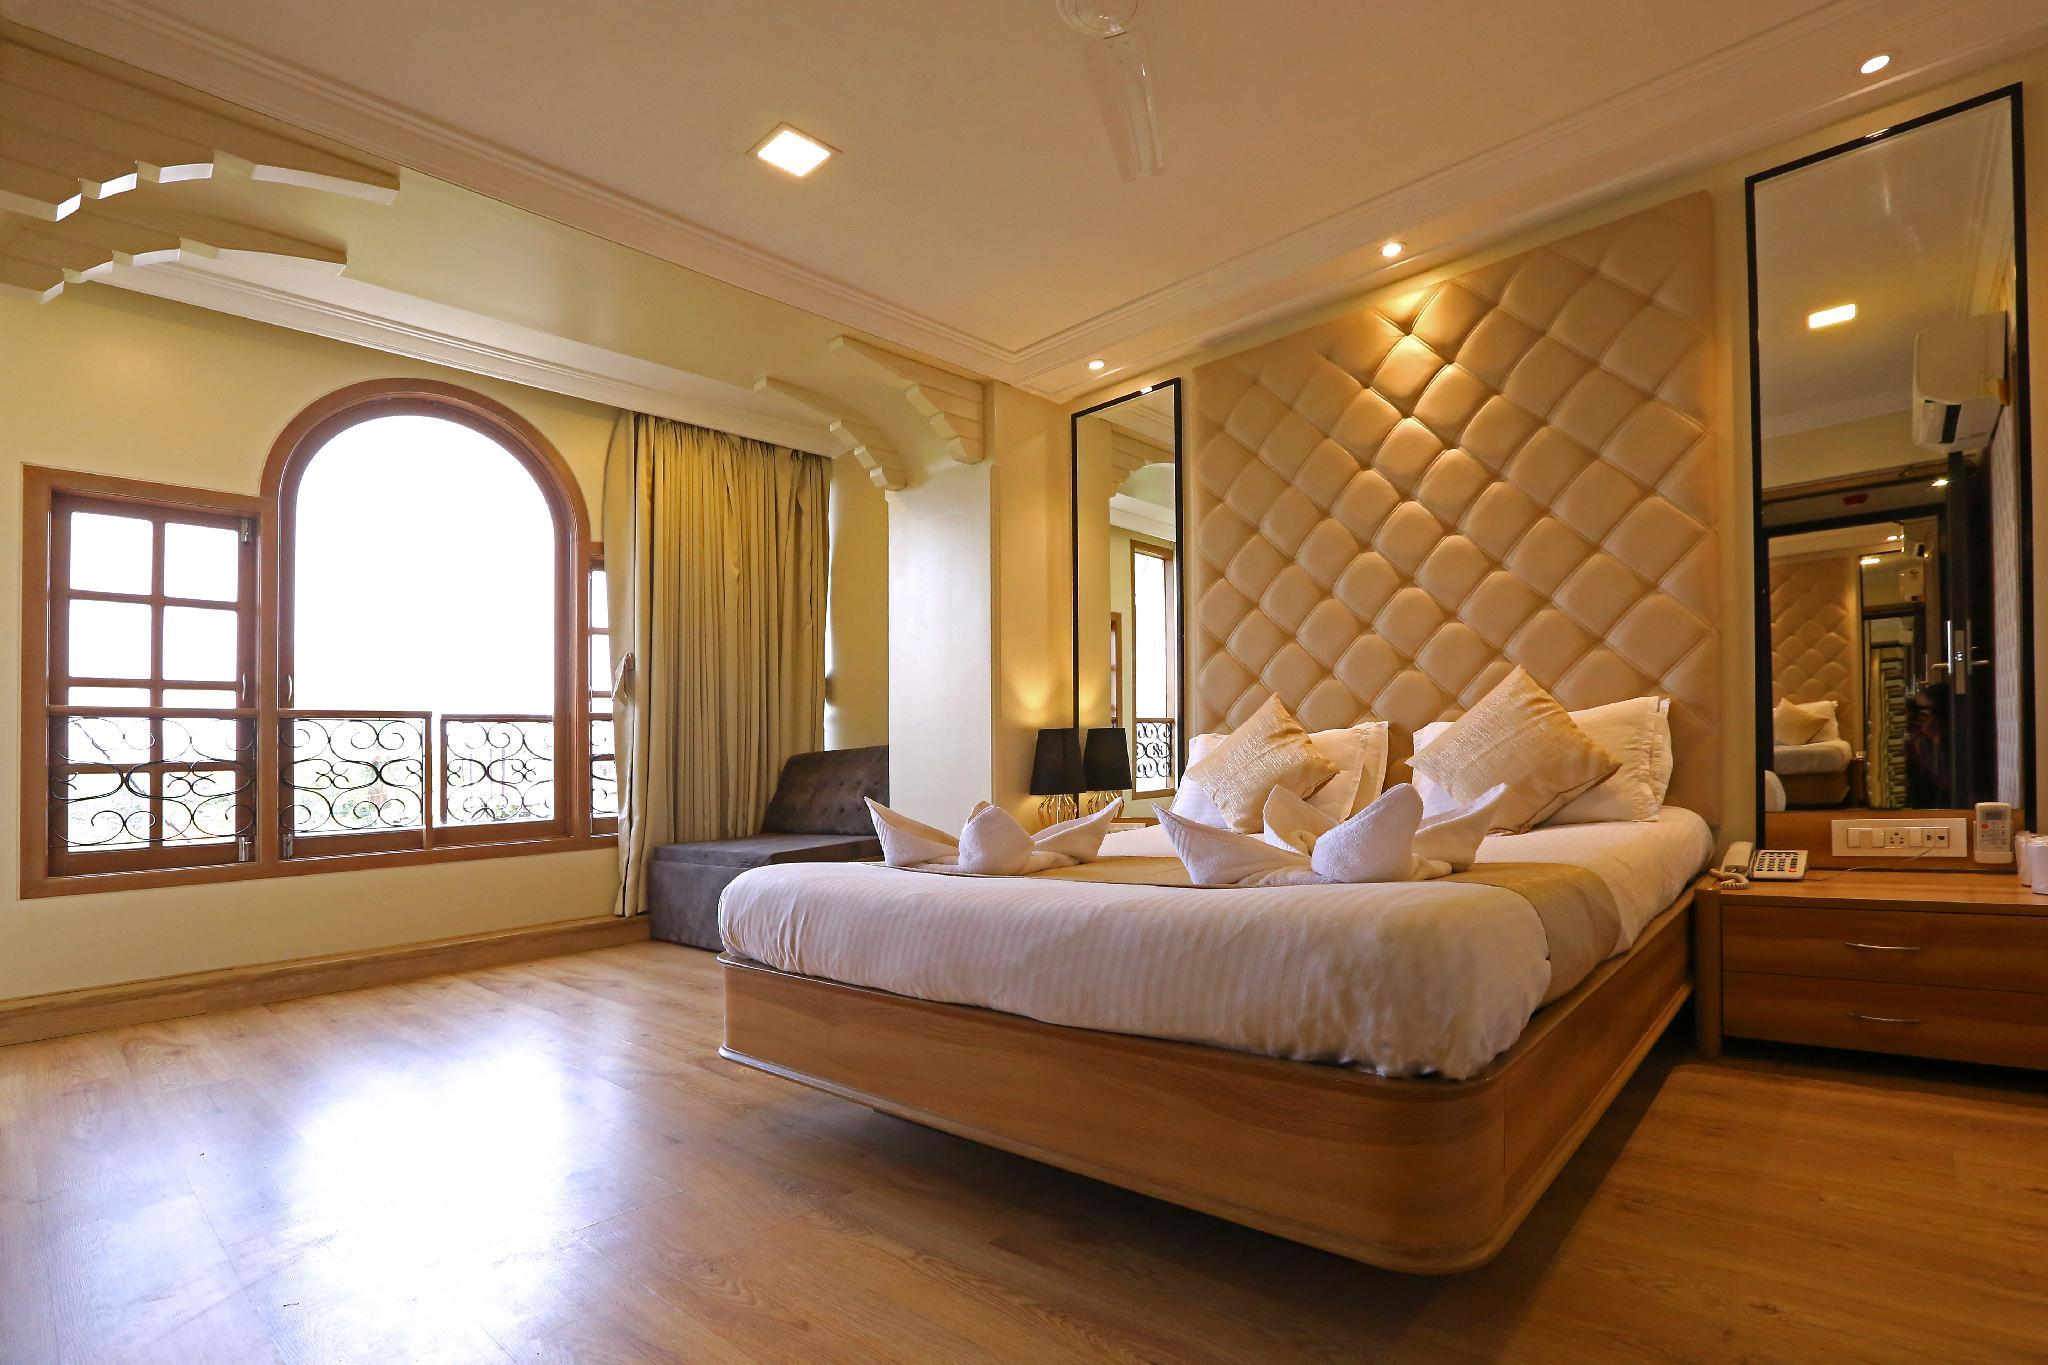 Gulf Hotel Colaba